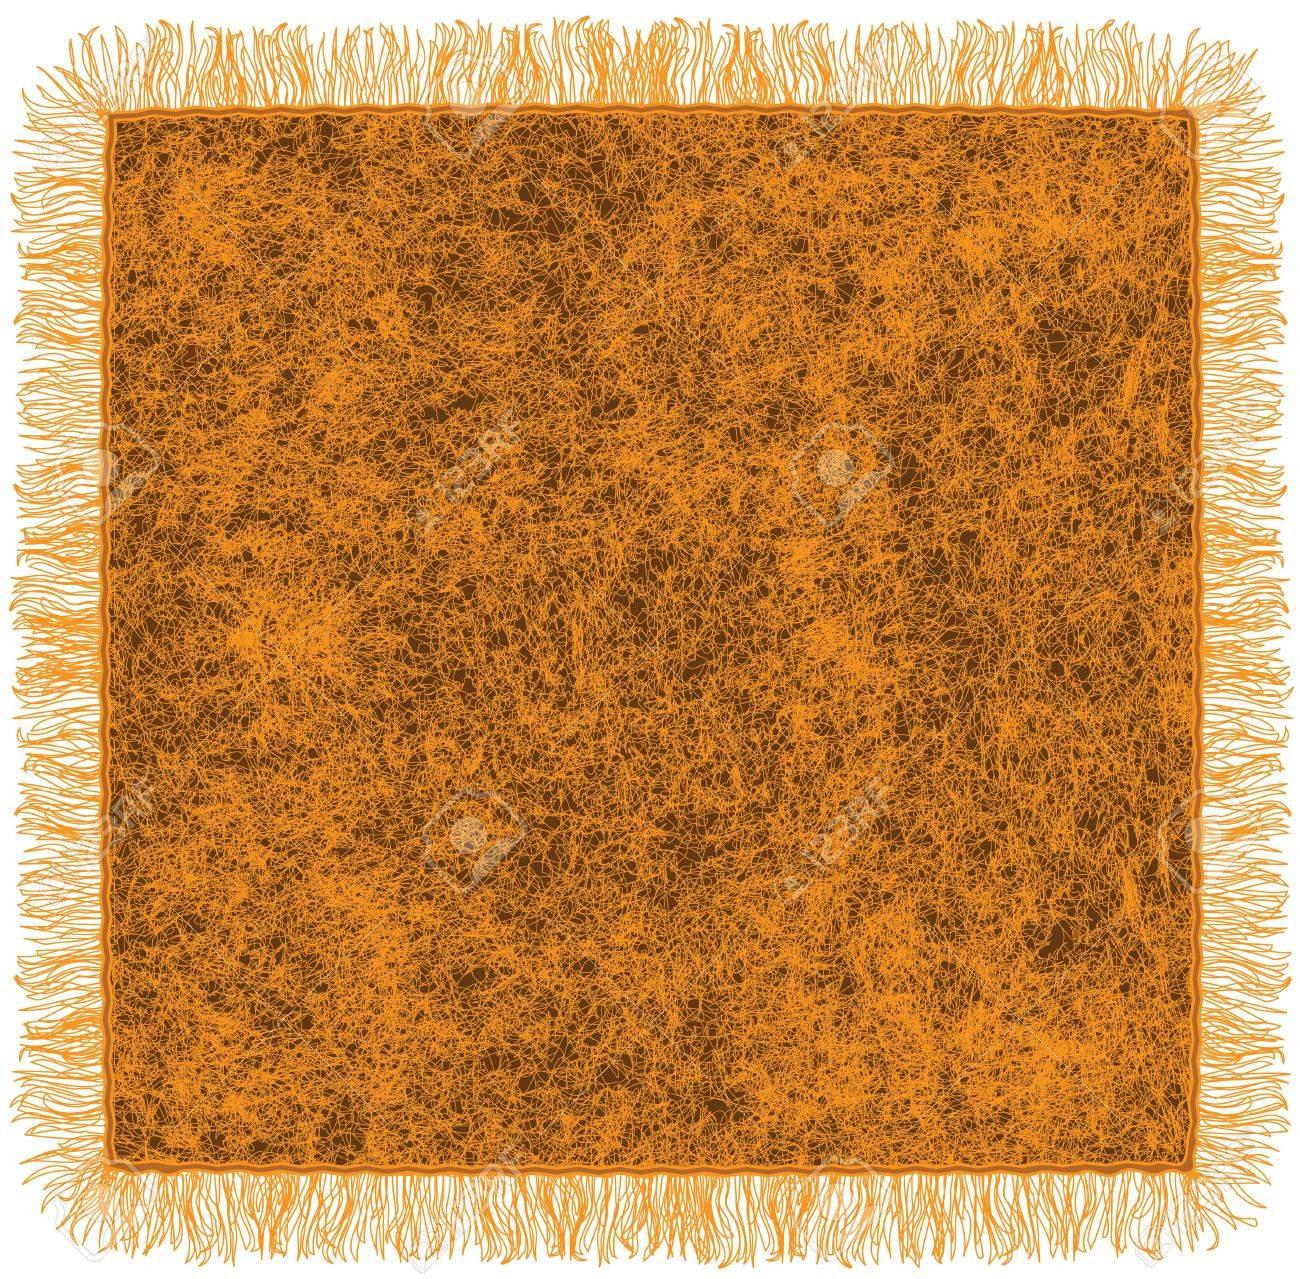 Woollen blanket with fringe in orange and brown colors Stock Vector - 16329529